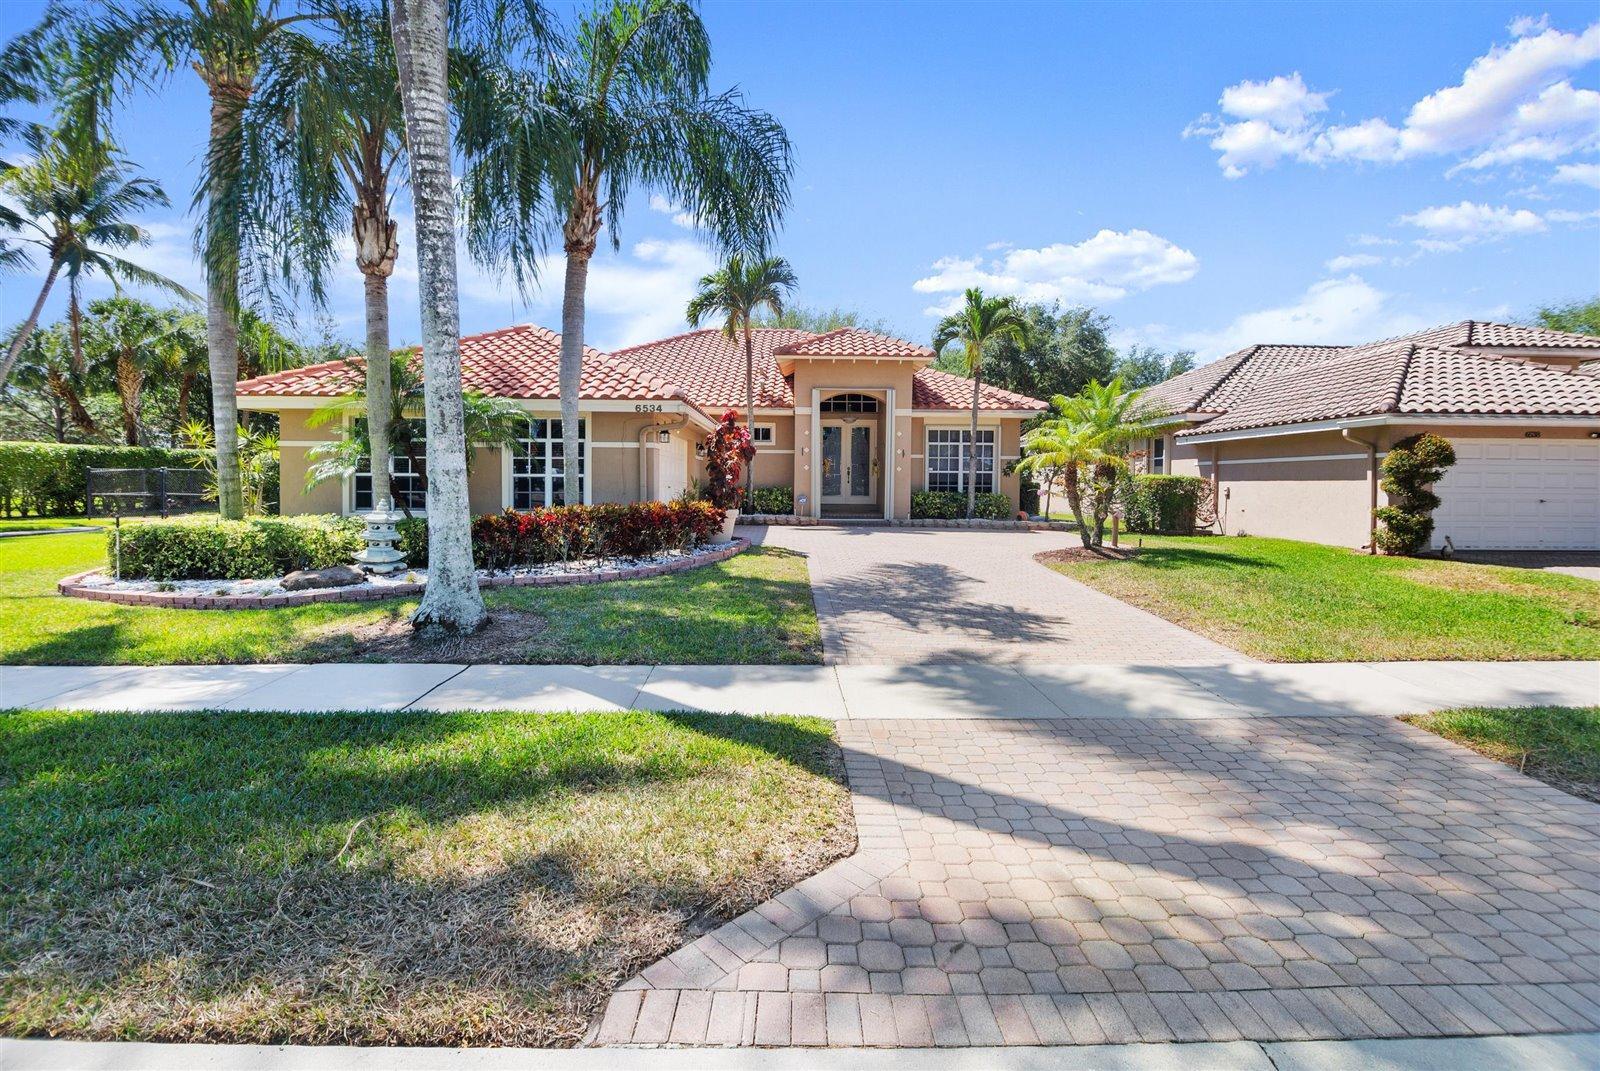 Home for sale in Sandhurst Boynton Beach Florida